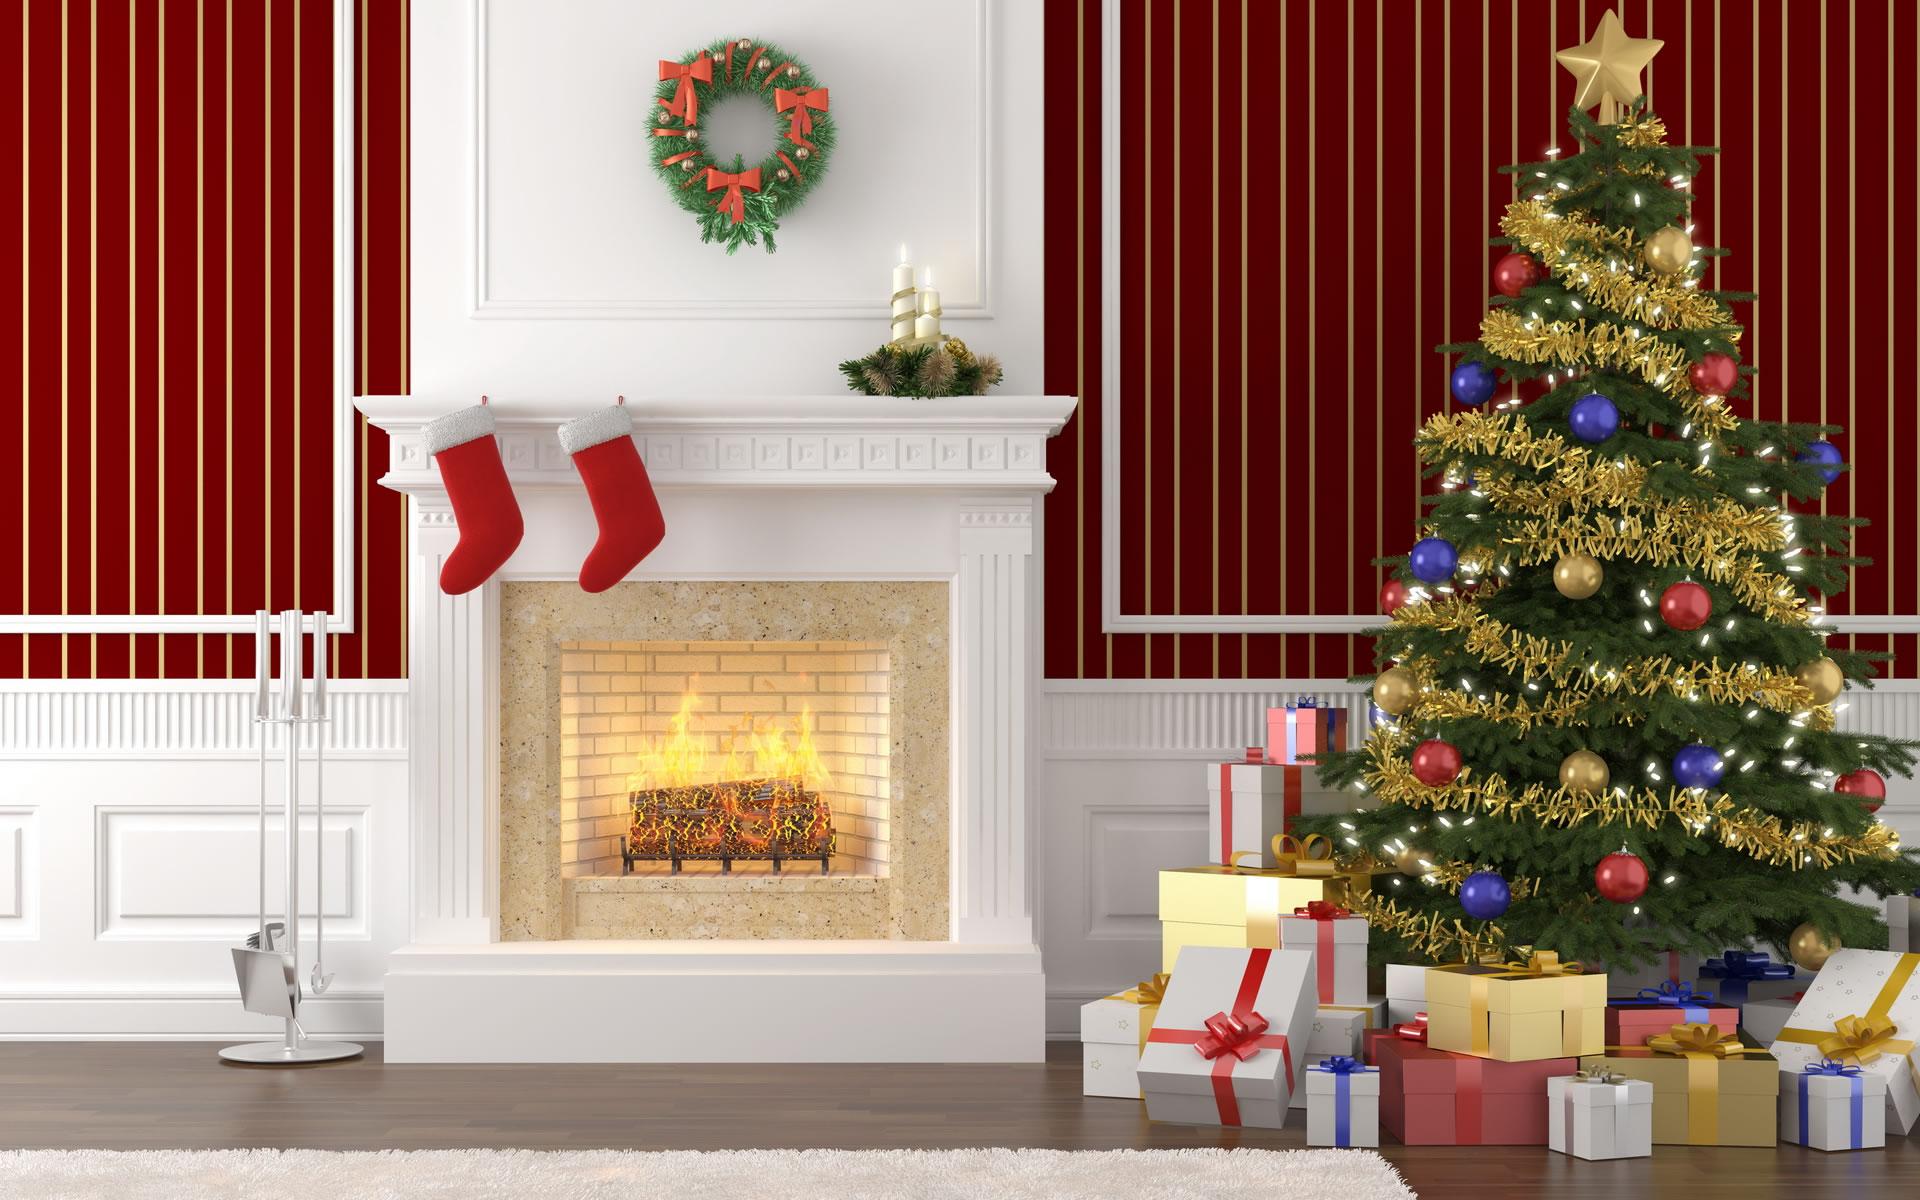 Increibles Wallpapers de Navidad